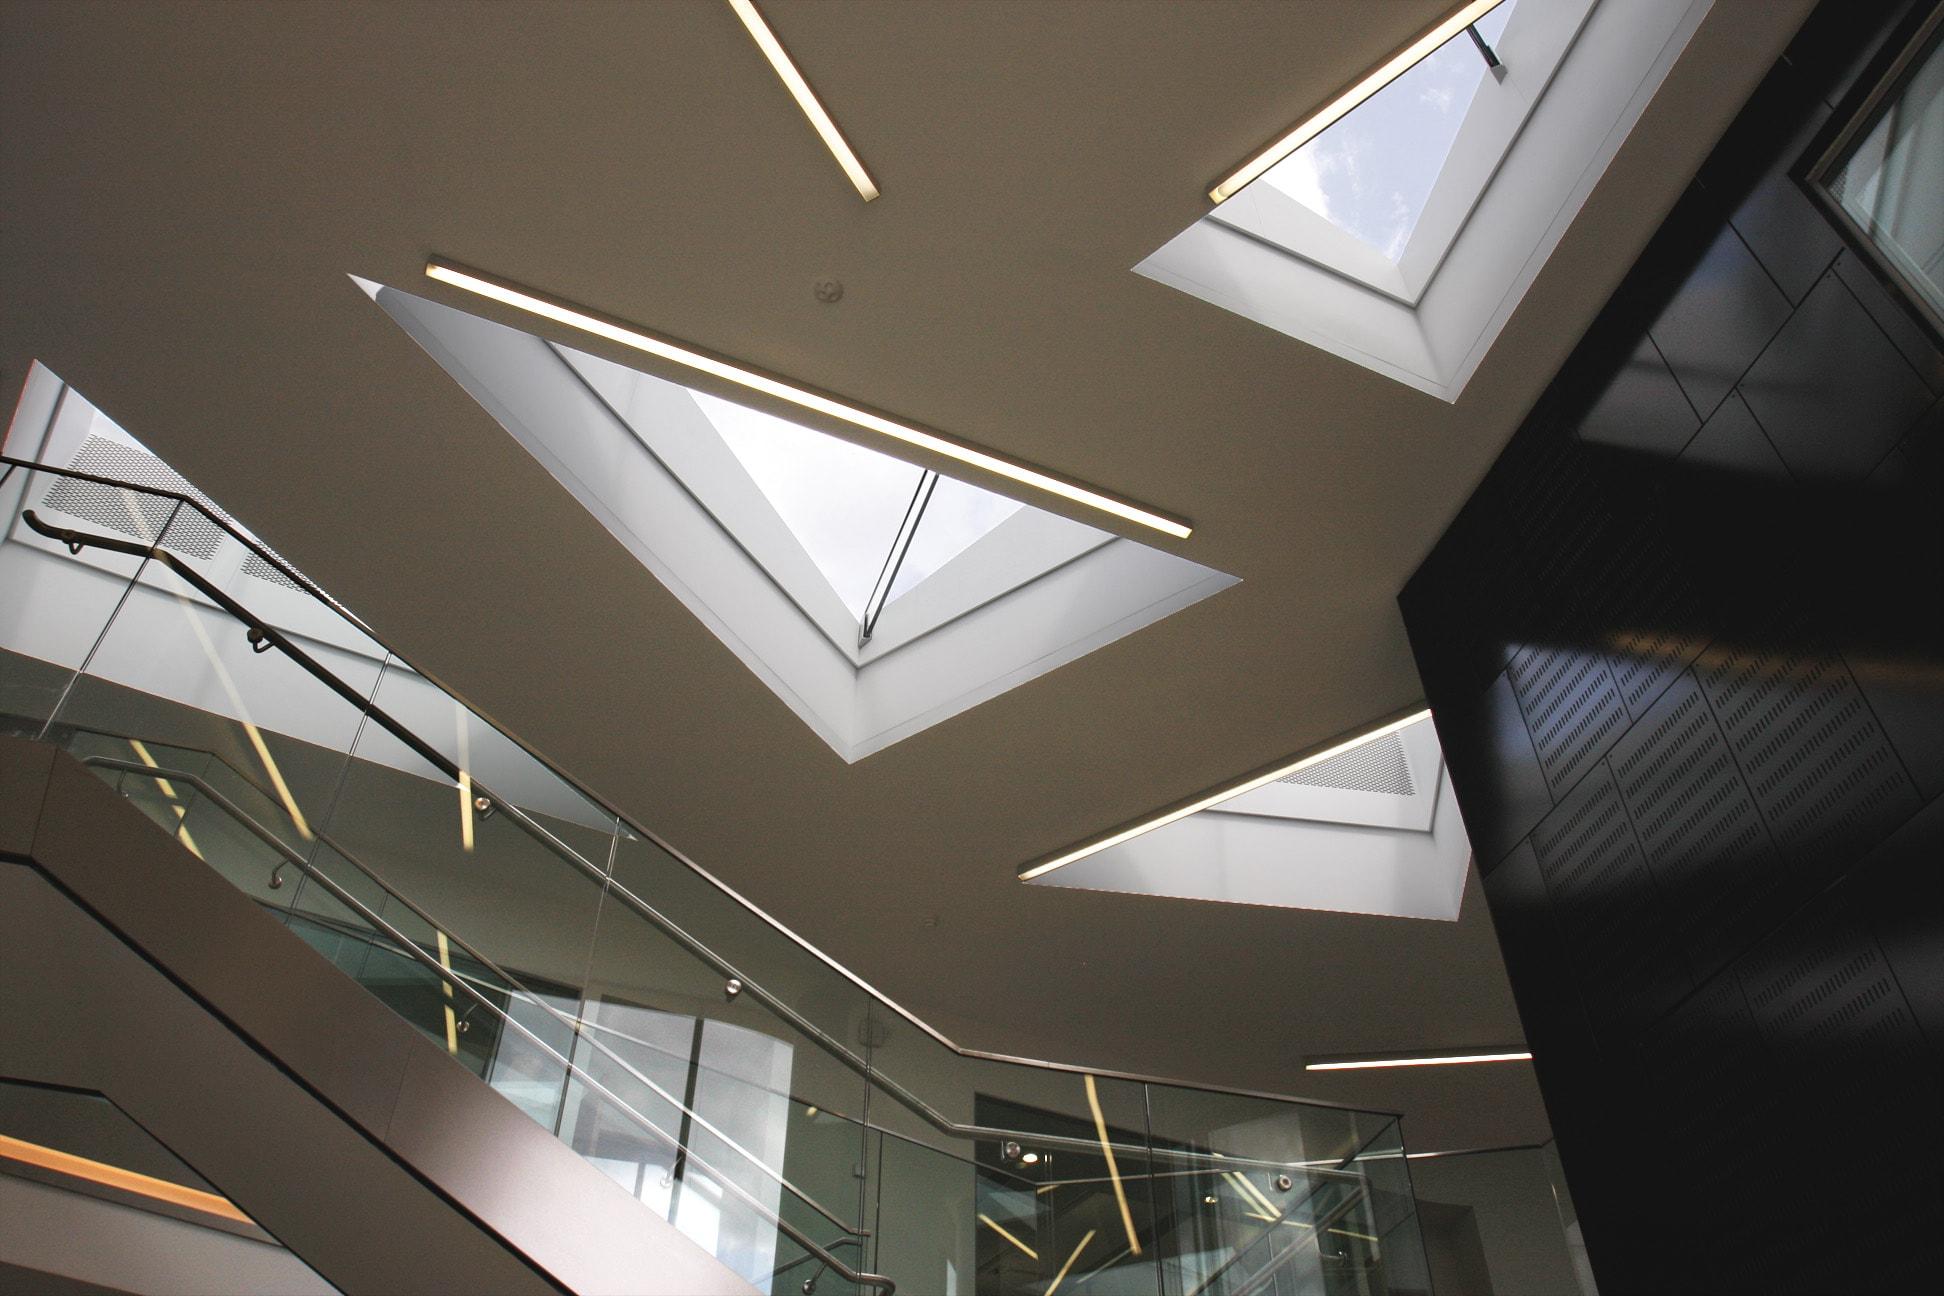 Bespoke triangular rooflight systems